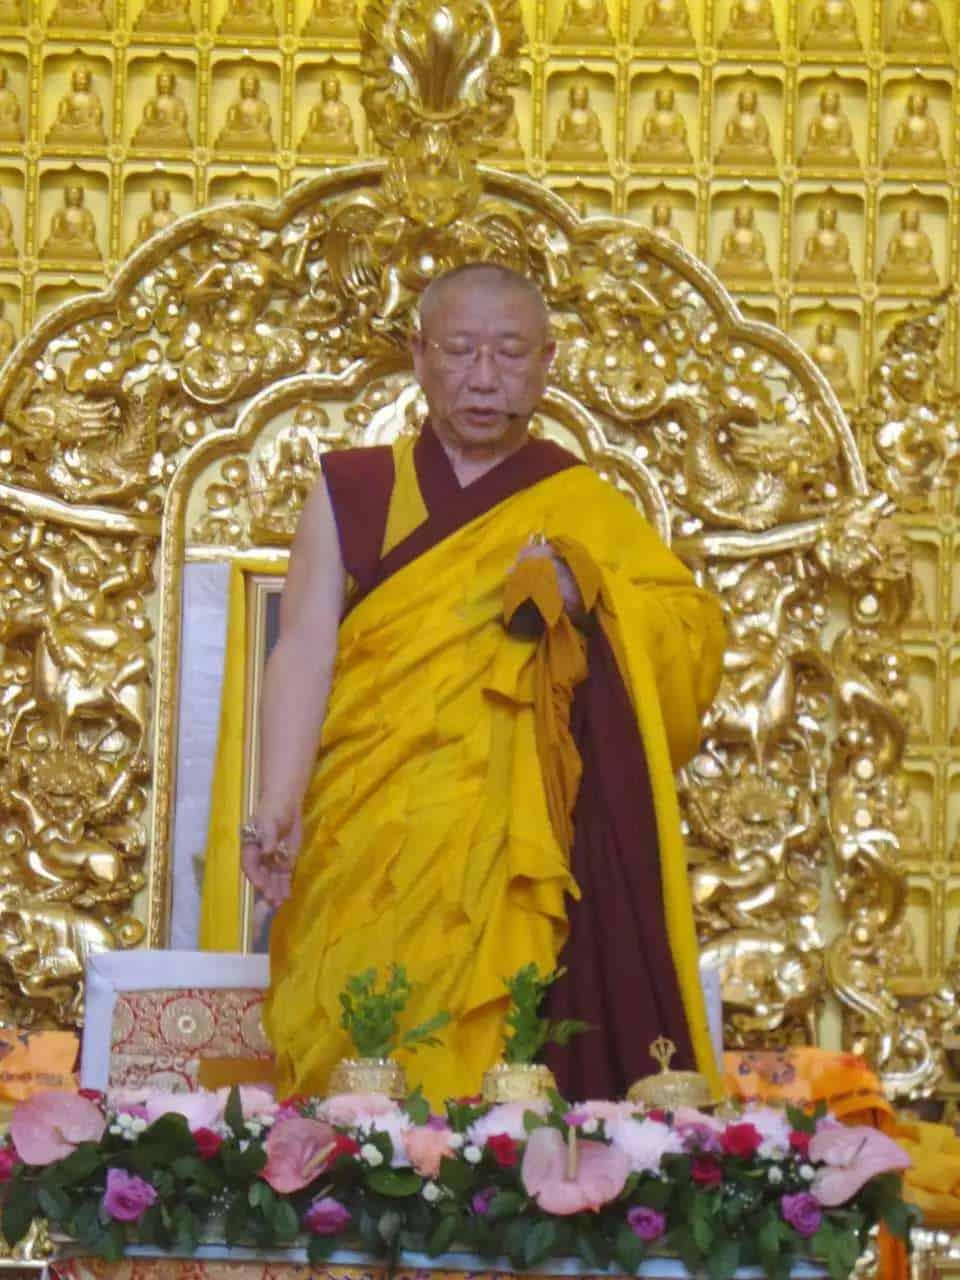 gosok-rinpoche-2016-07-a887691b37a016e2bee5ae491037dfc